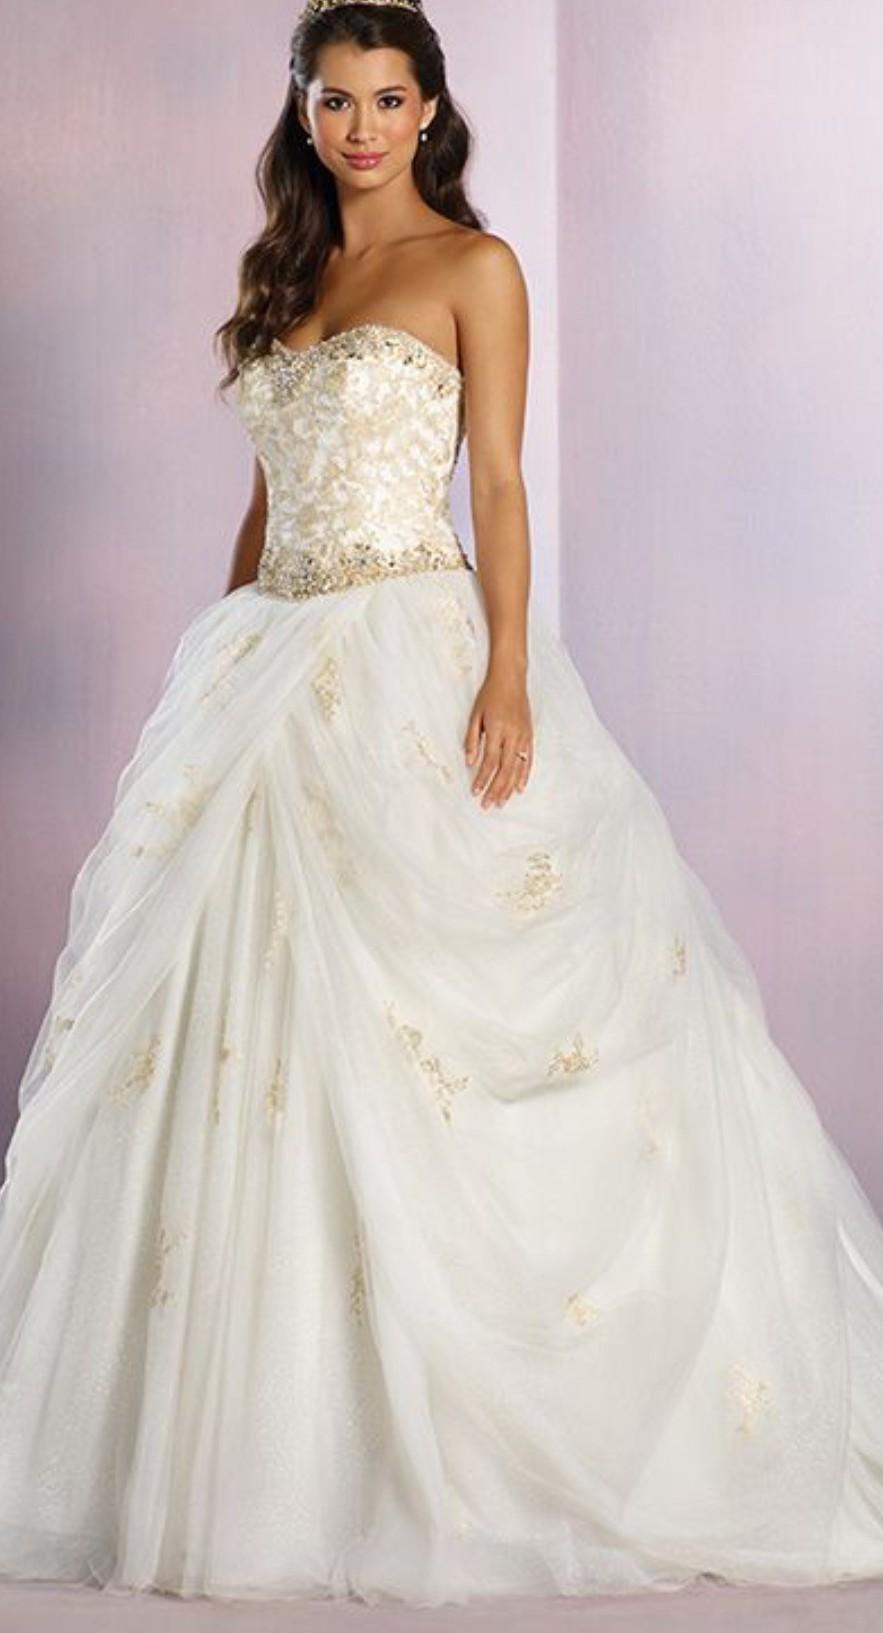 Disney Wedding Dresses Belle Alfred Angelo Pemerintah Kota Ambon